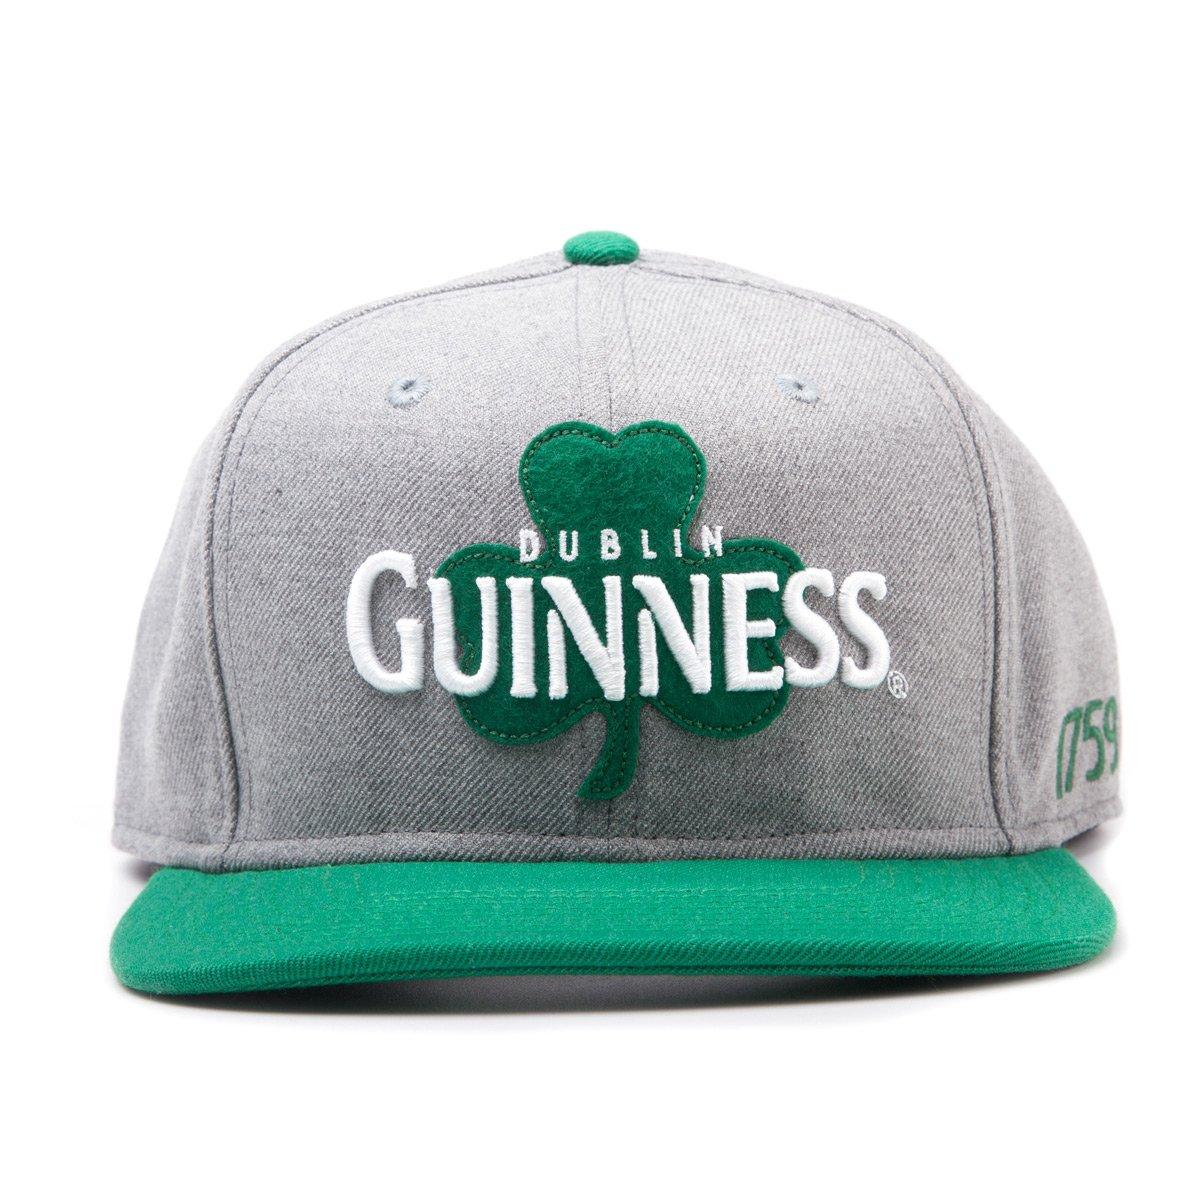 00d17210cde Amazon.com  Guinness Dublin Shamrock Snapback Baseball Cap (Grey  Green)   Toys   Games